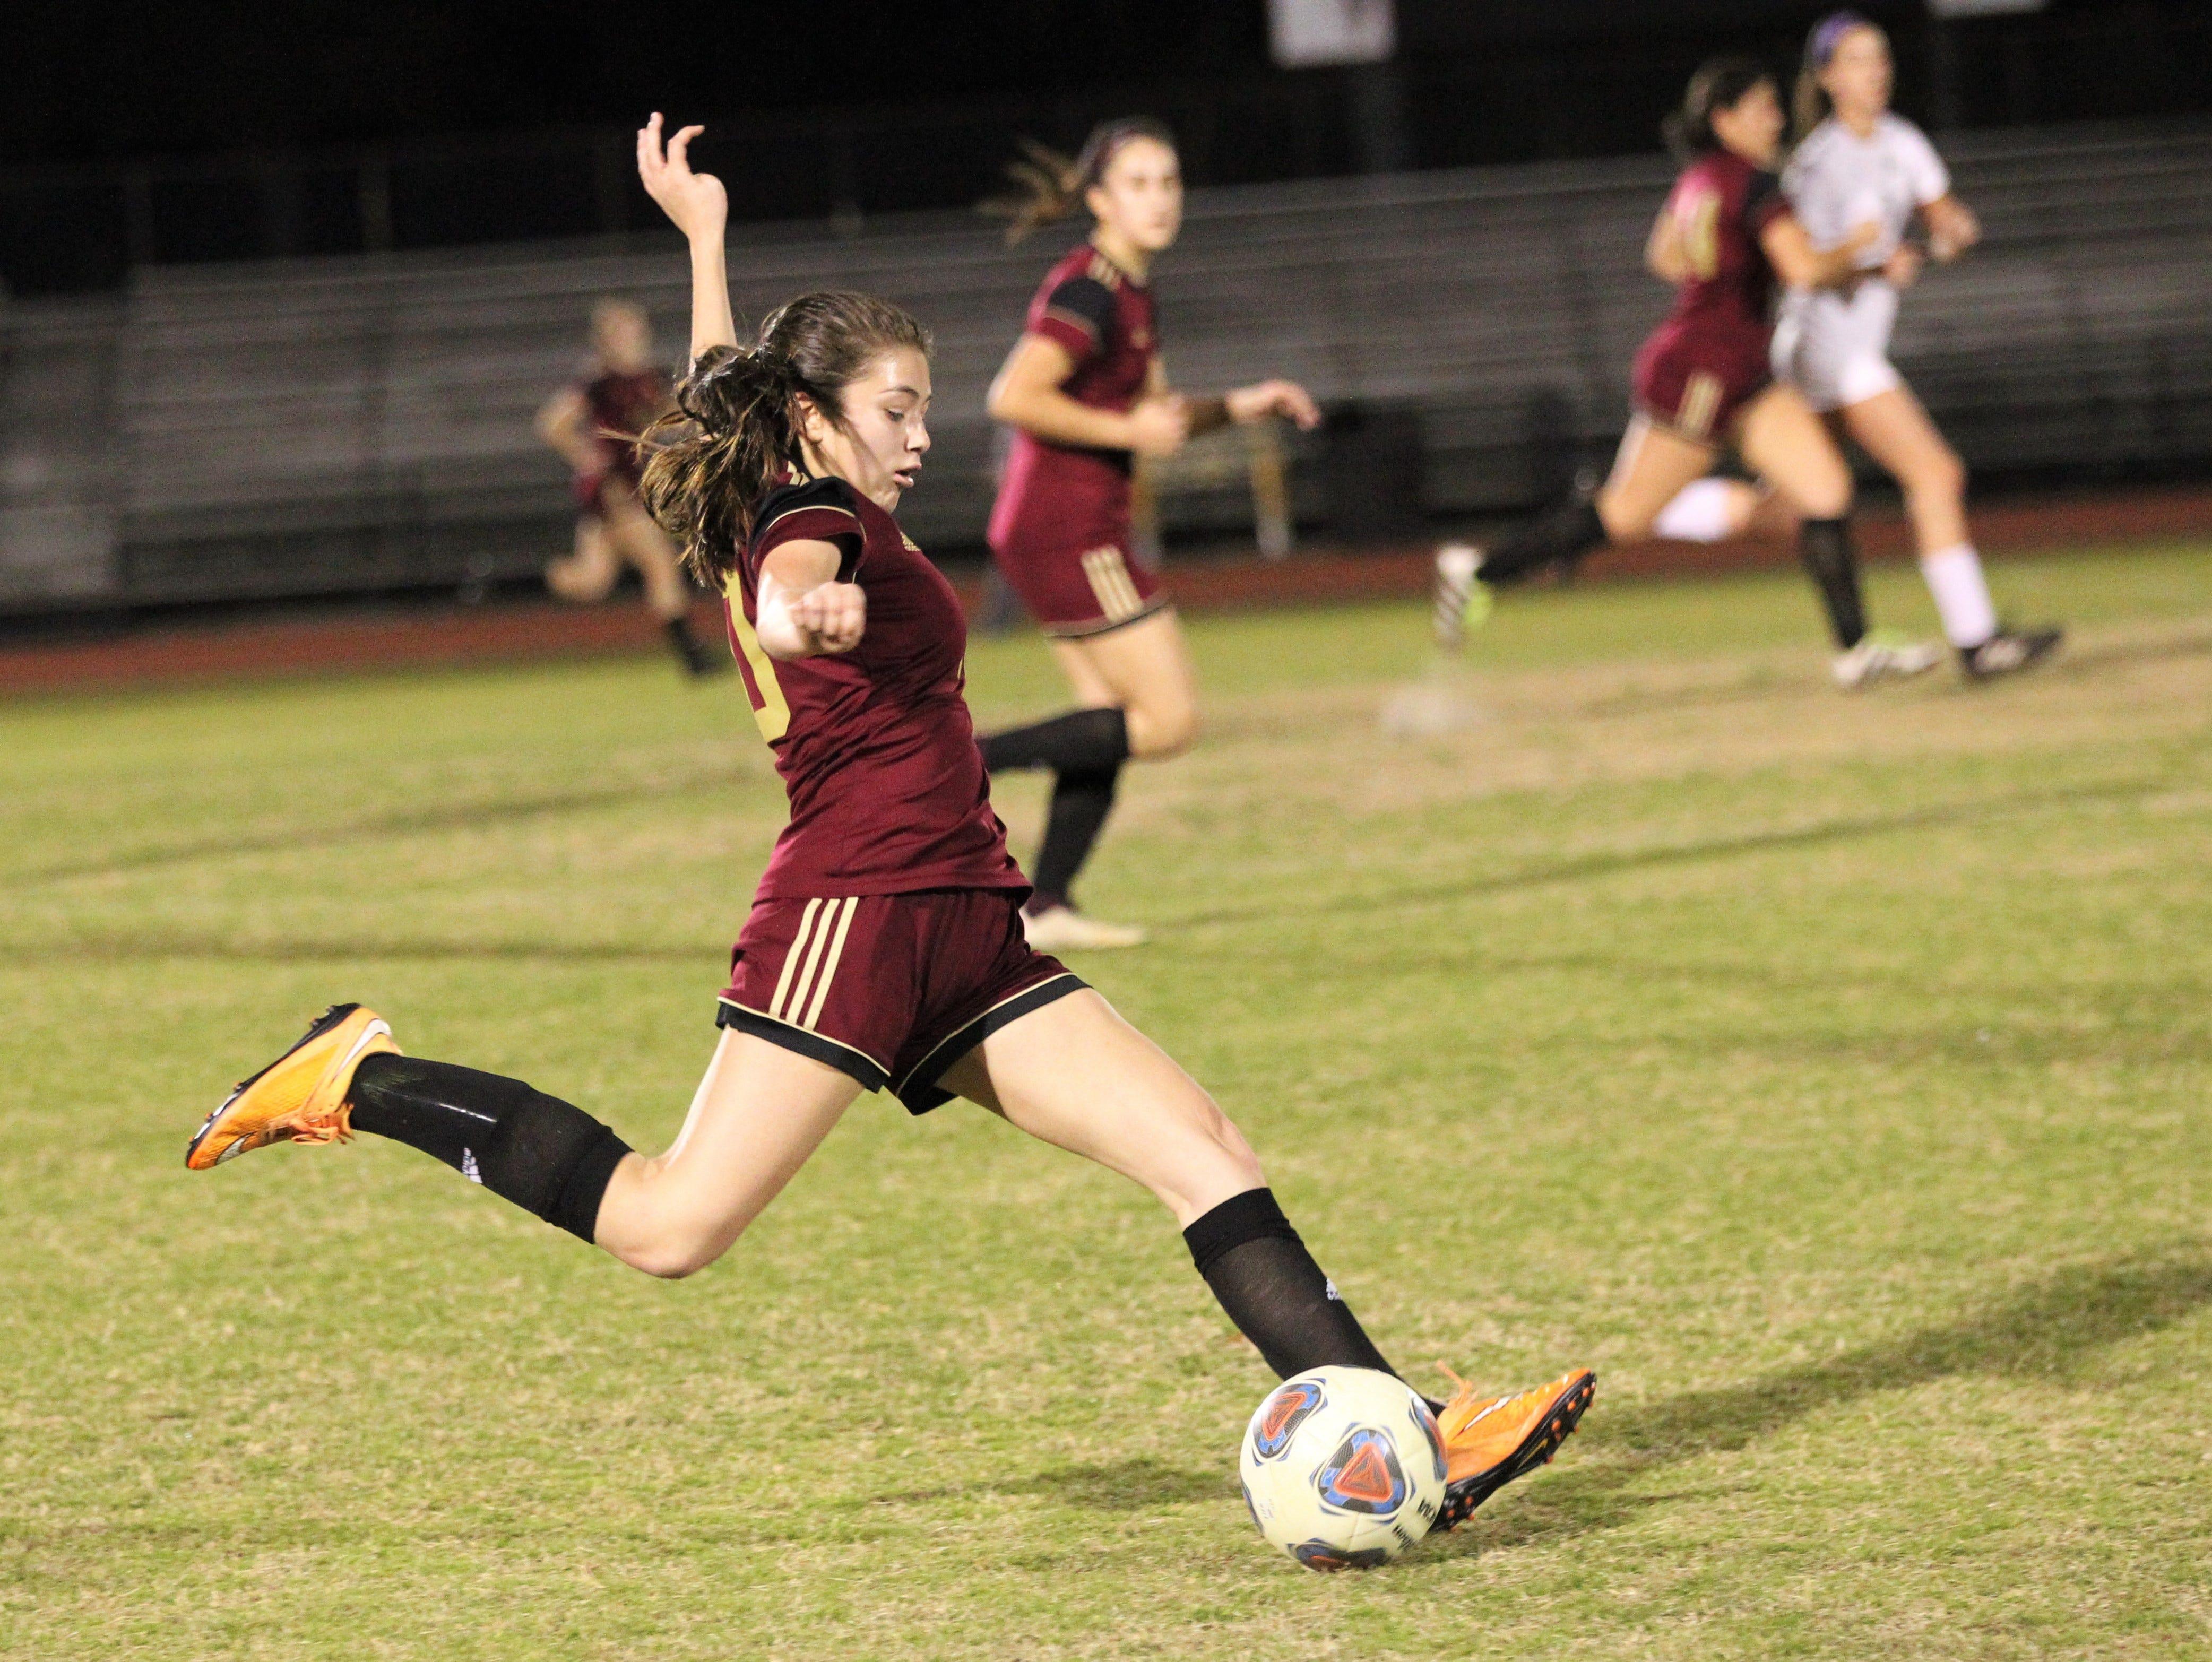 Florida High's Adriana Limburg passes ahead as South Walton's girls soccer team edged the Seminoles 5-4 in a penalty-kick shootout during a Region 1-2A semifinal on Feb. 8, 2019.